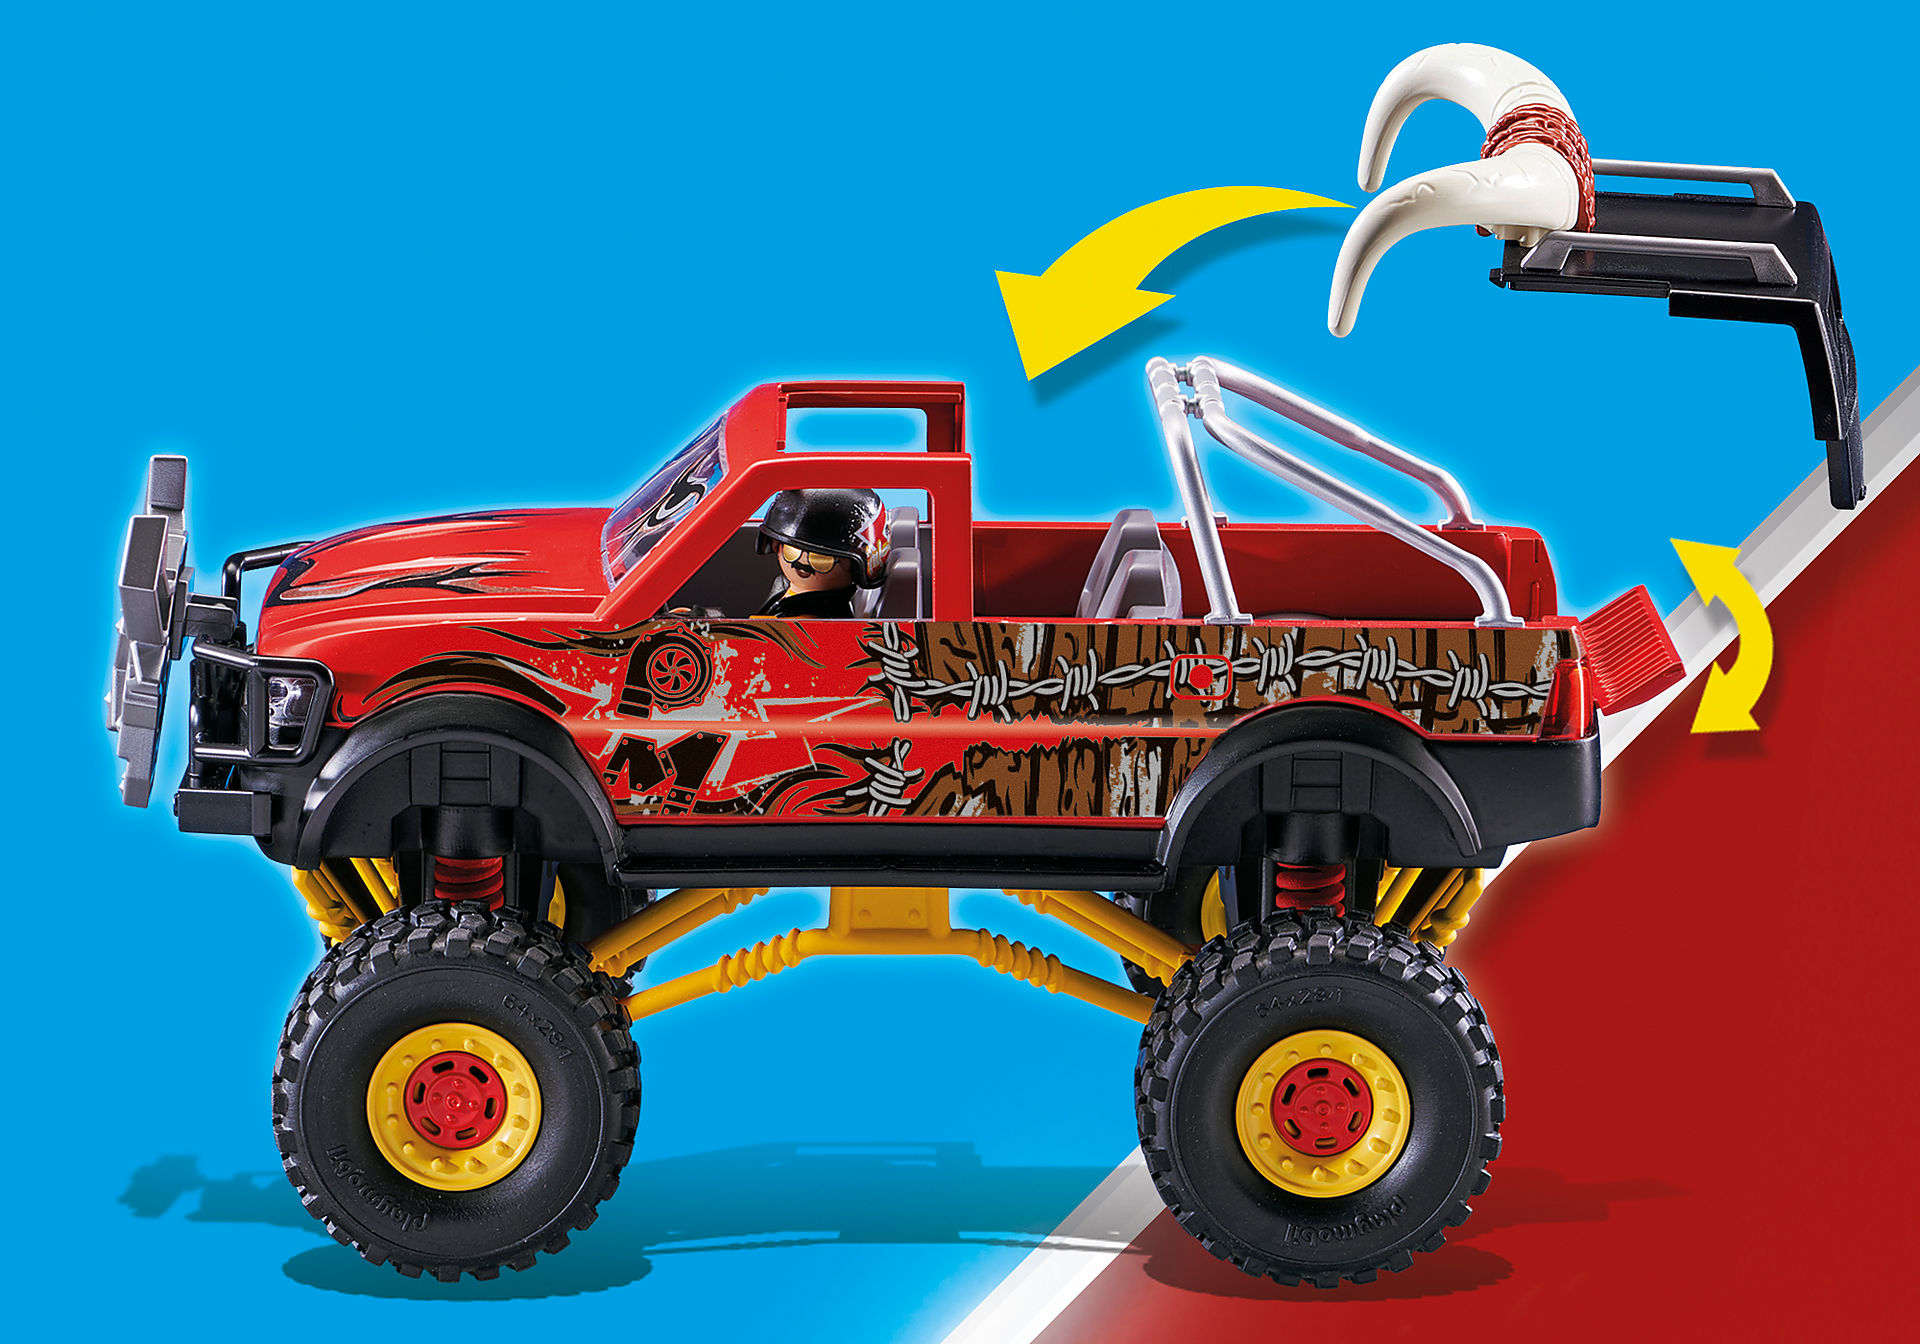 70549 Stuntshow Monster Truck Horned zoom image7